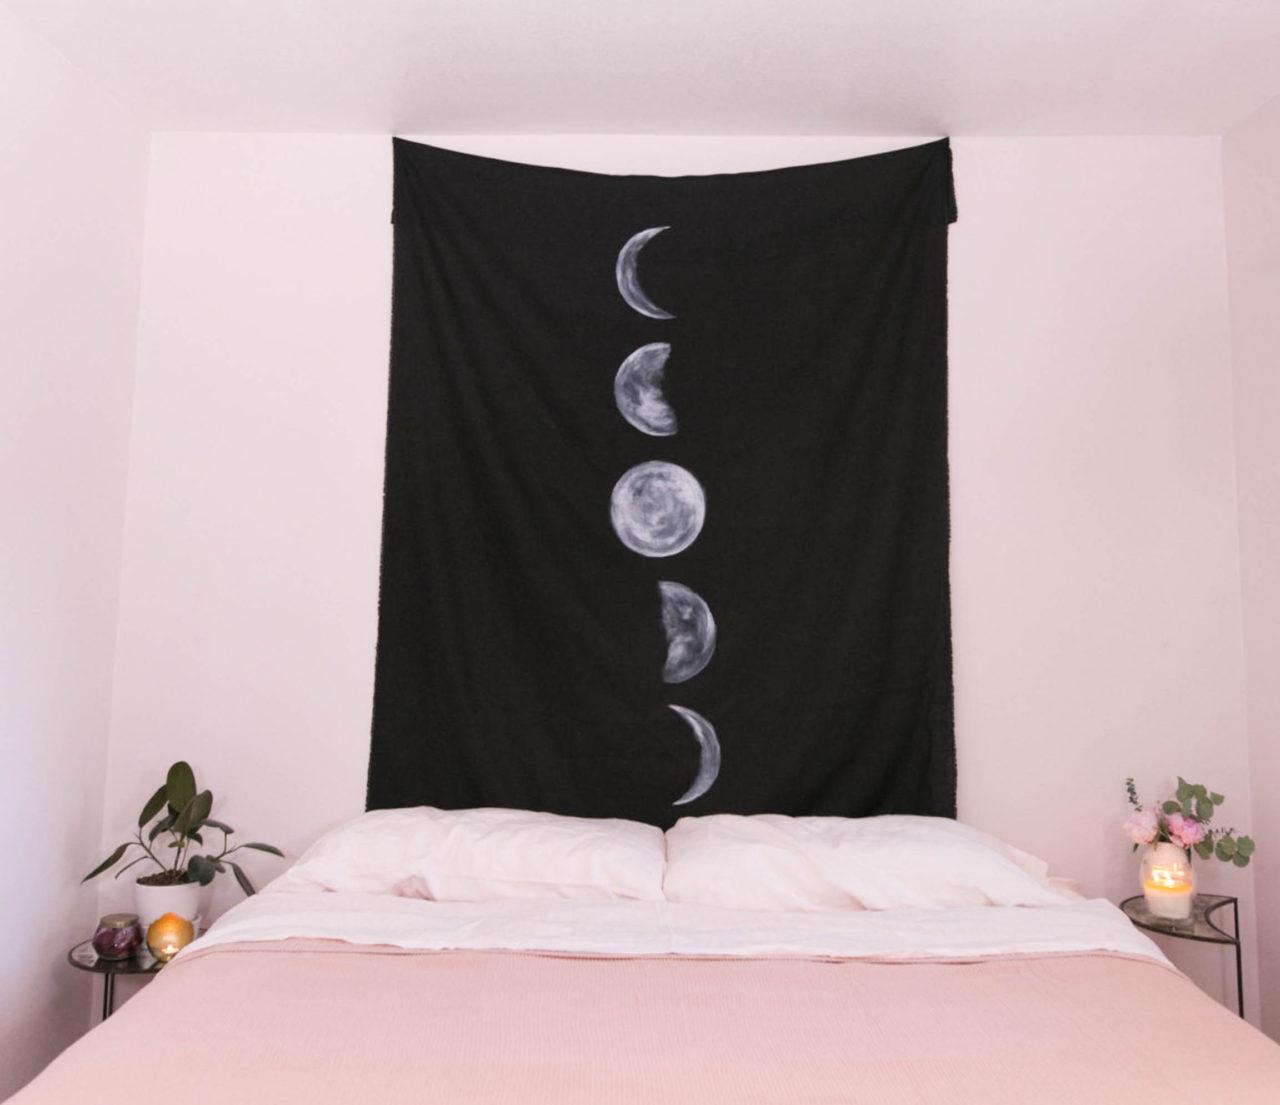 mrkate_pinkbedroom-1-of-1